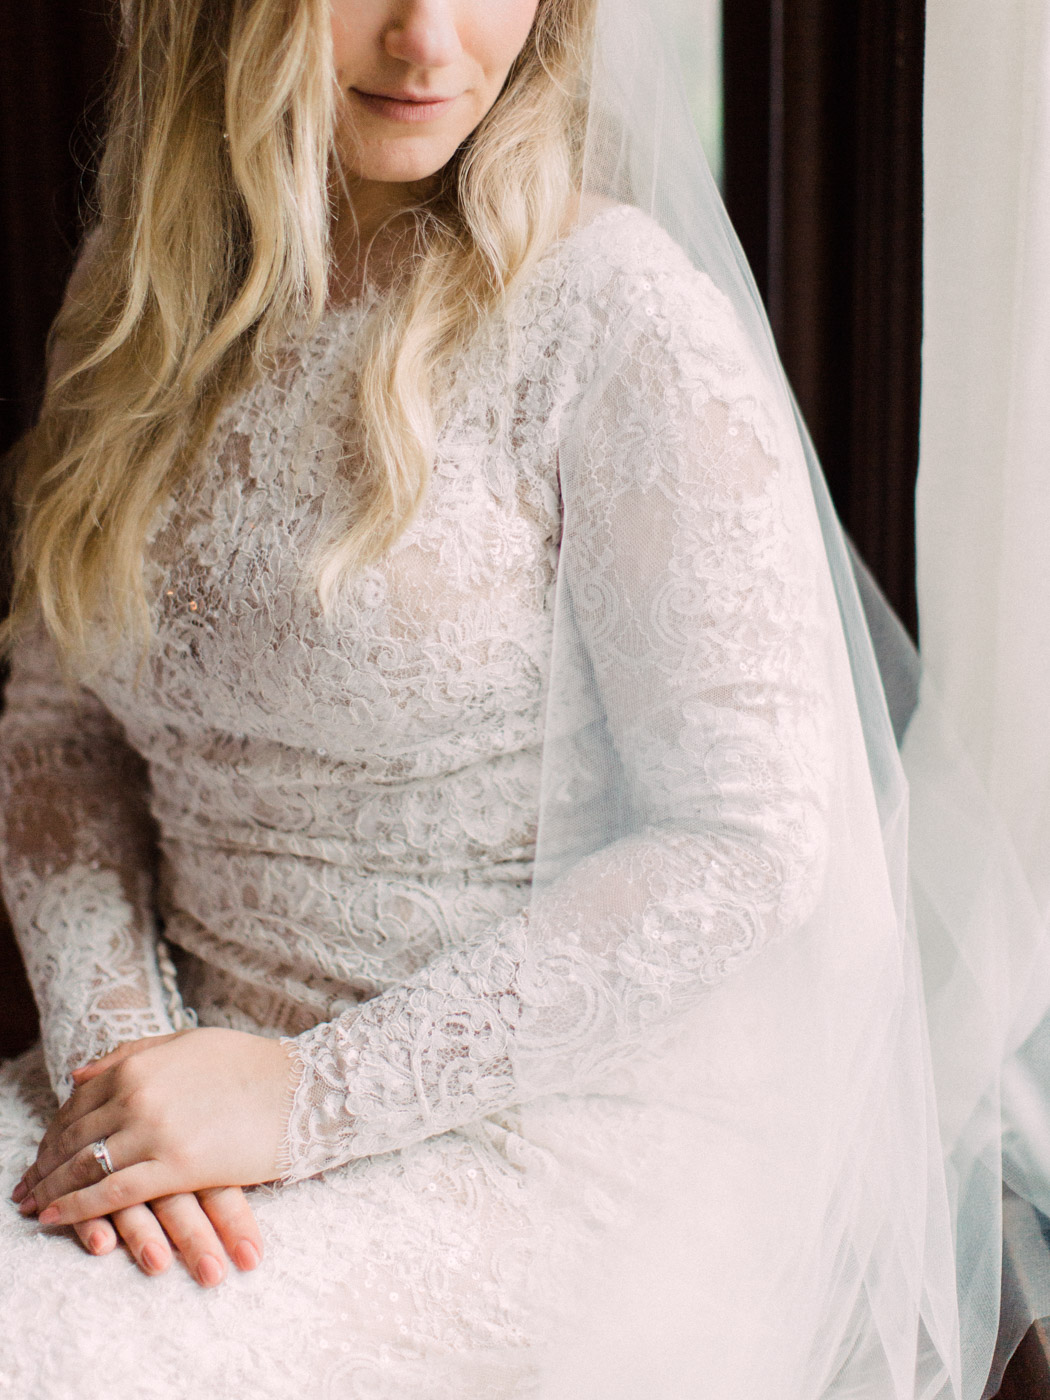 Toronto-wedding-photographer-intimate-classic-fine-art-elopement-ottawa72.jpg